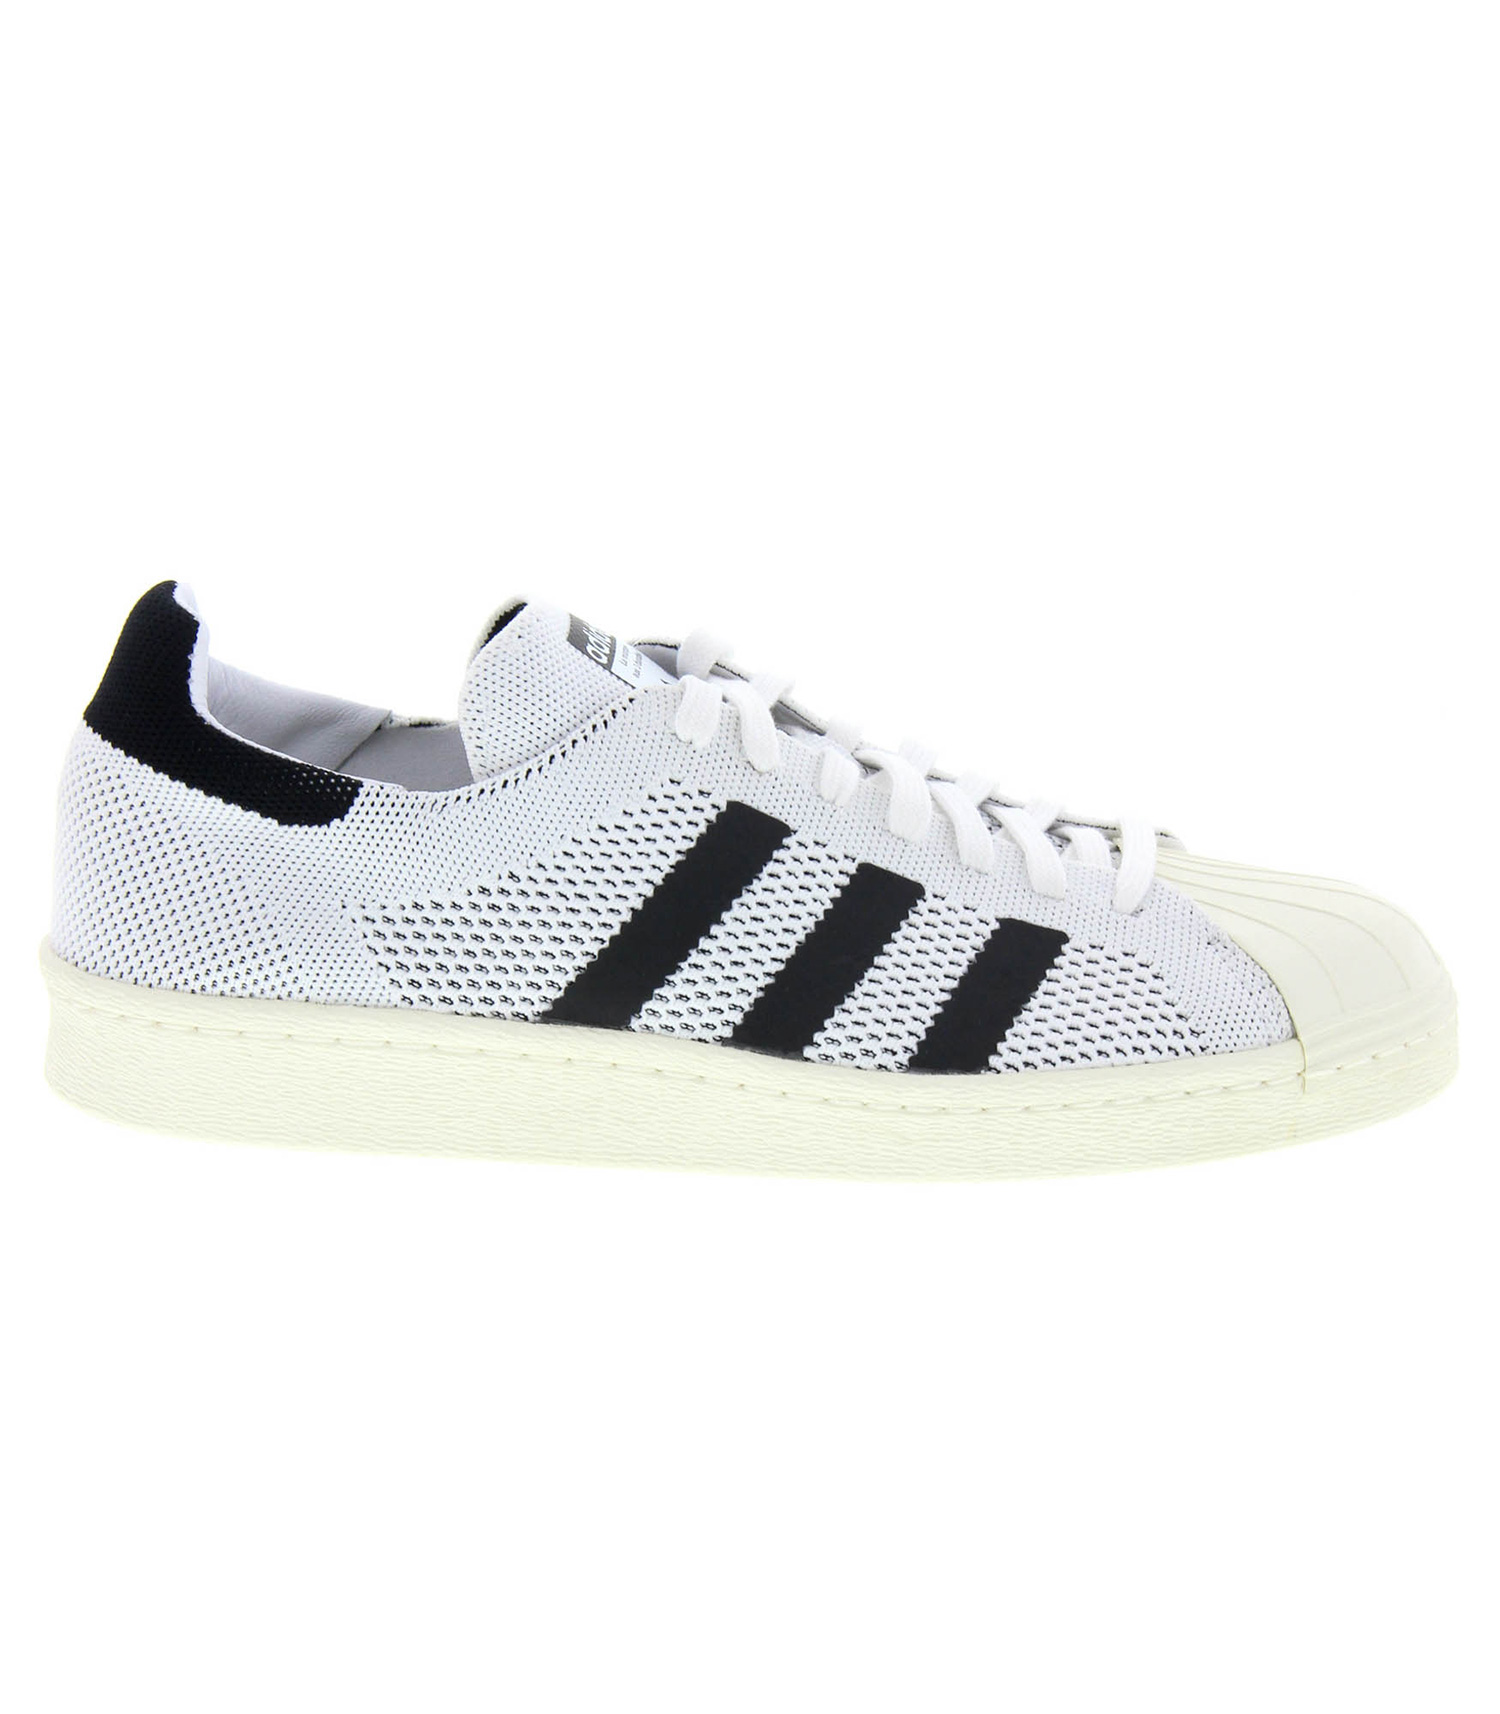 Sneakers Superstar 80s Primeknit Blanc/Noir